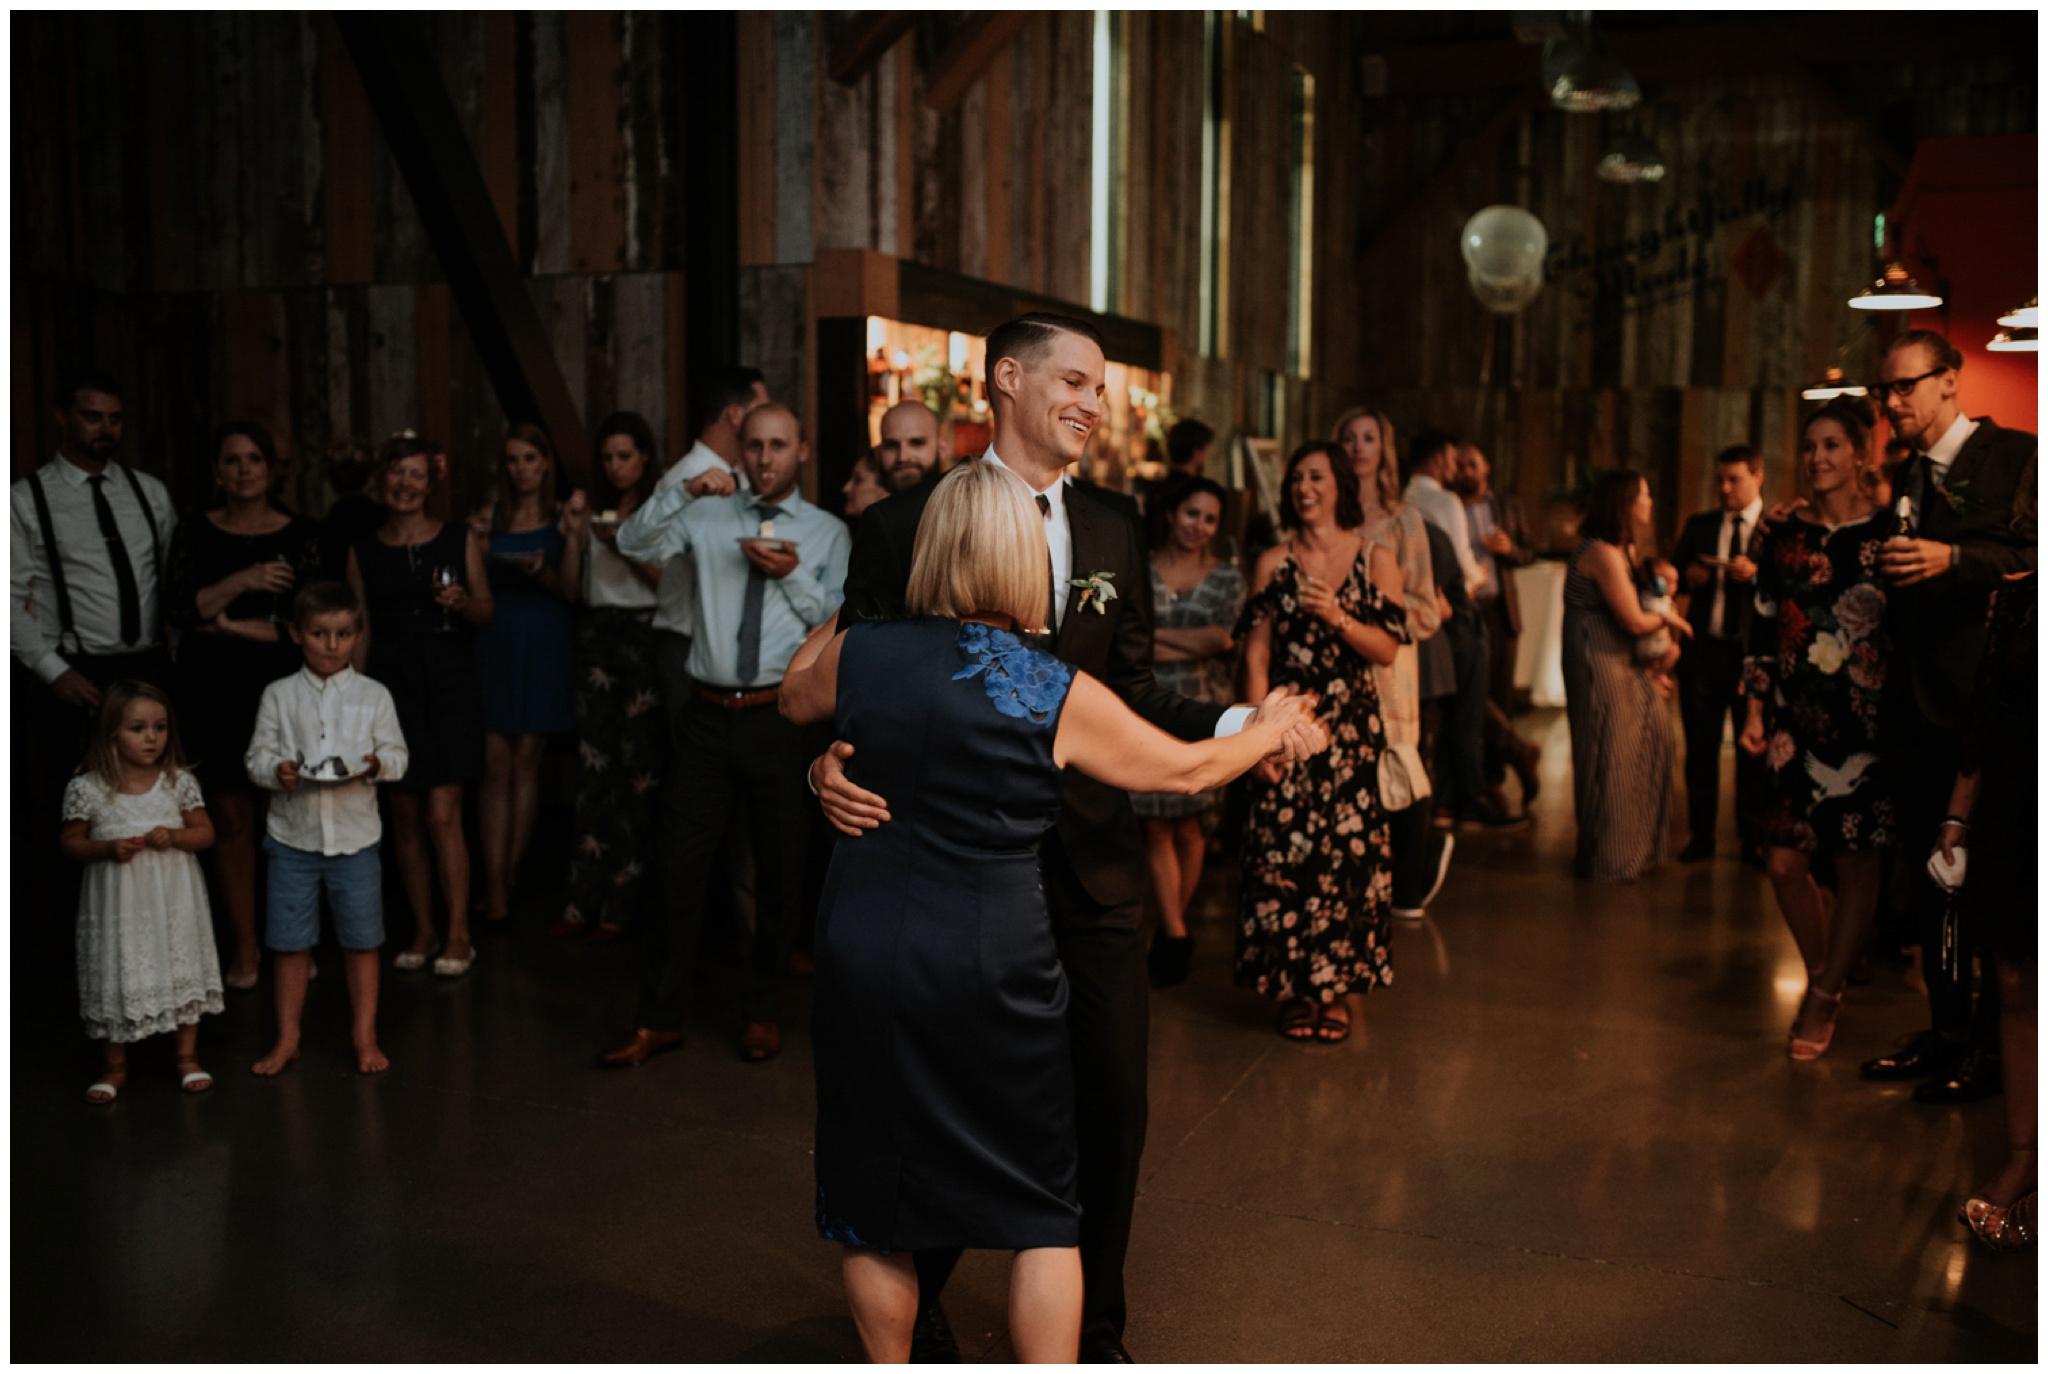 alyssa-keiran-westland-distillery-urban-seattle-wedding-photographer-caitlyn-nikula-153.jpg